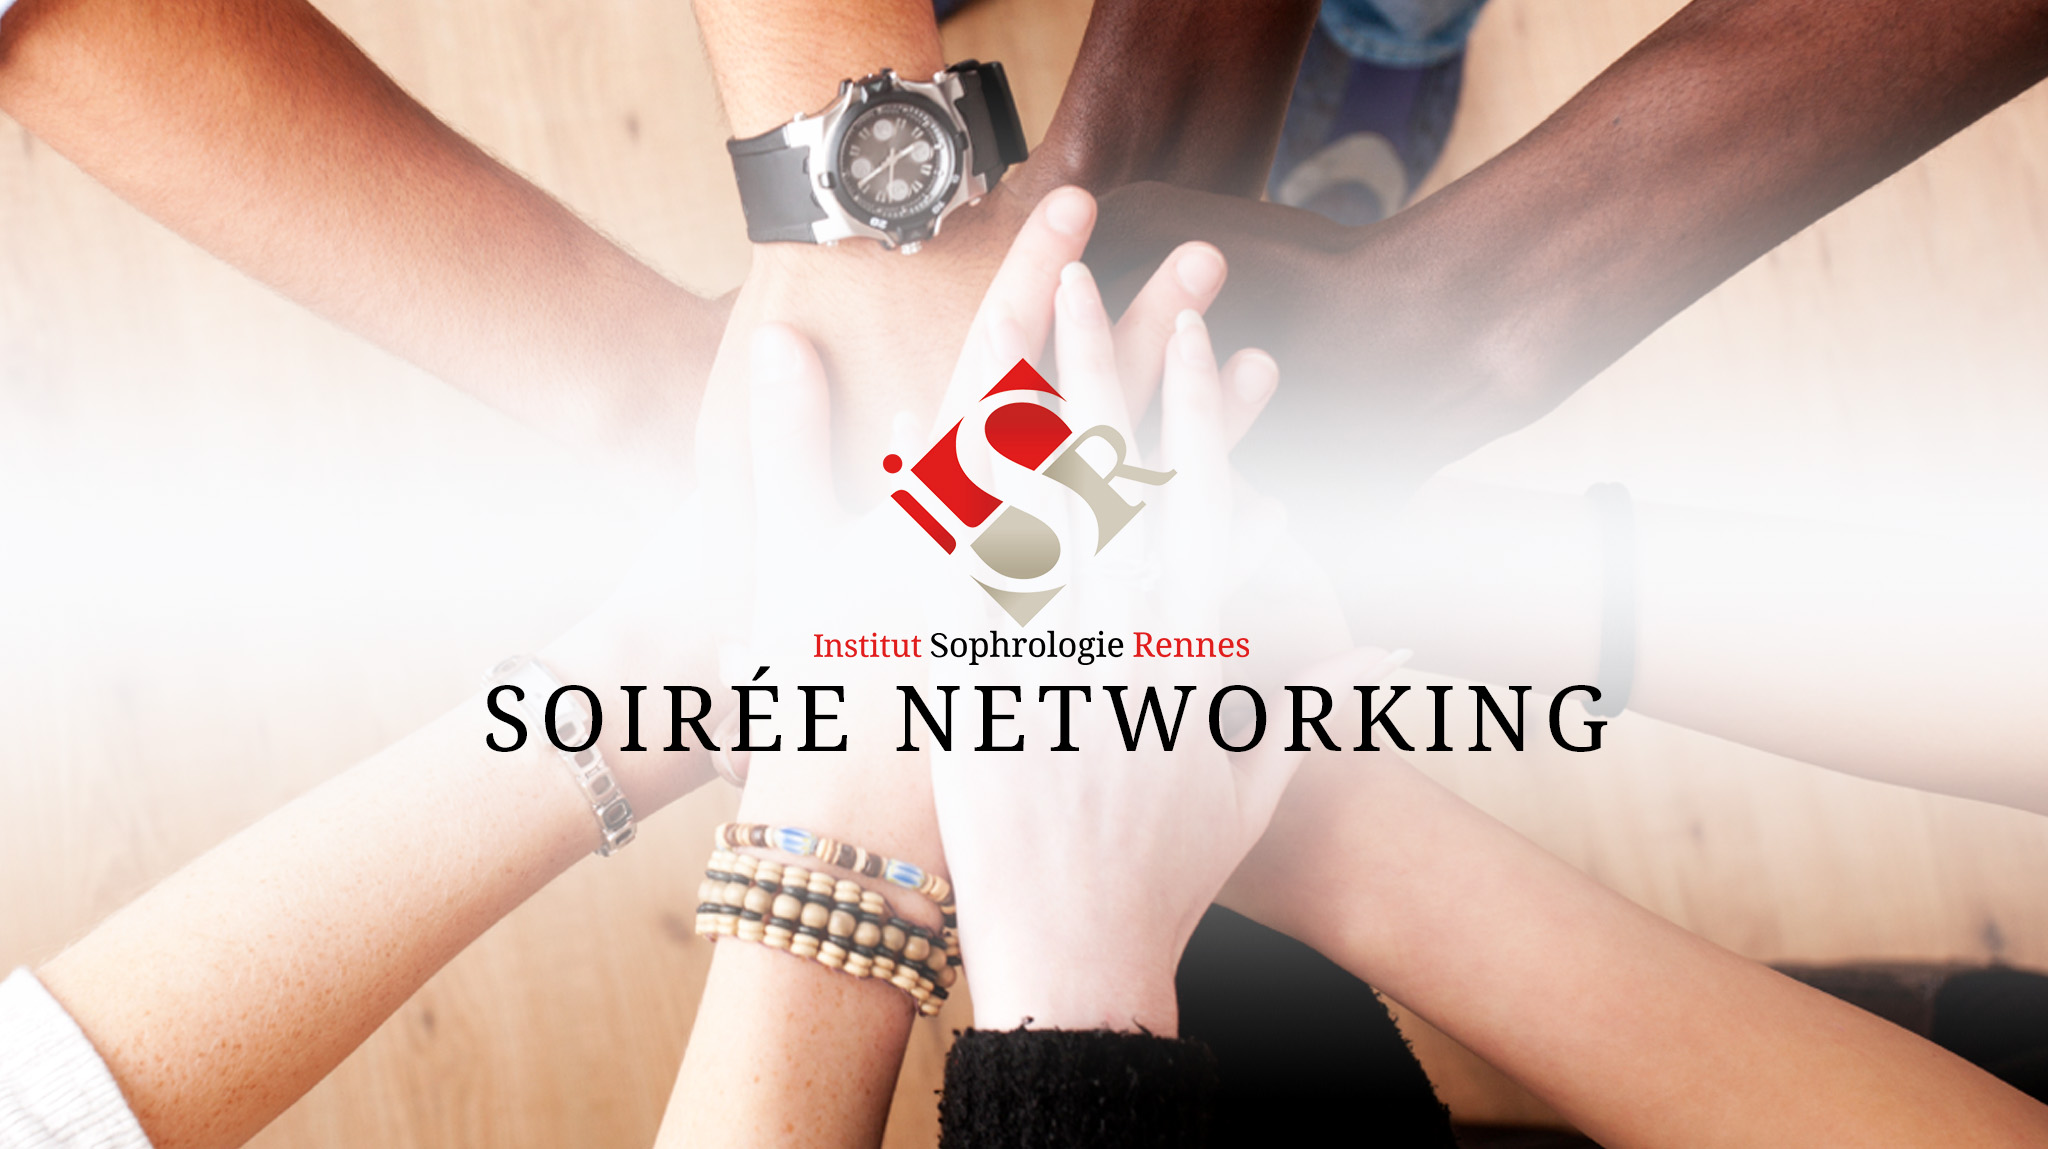 Soirée Networking